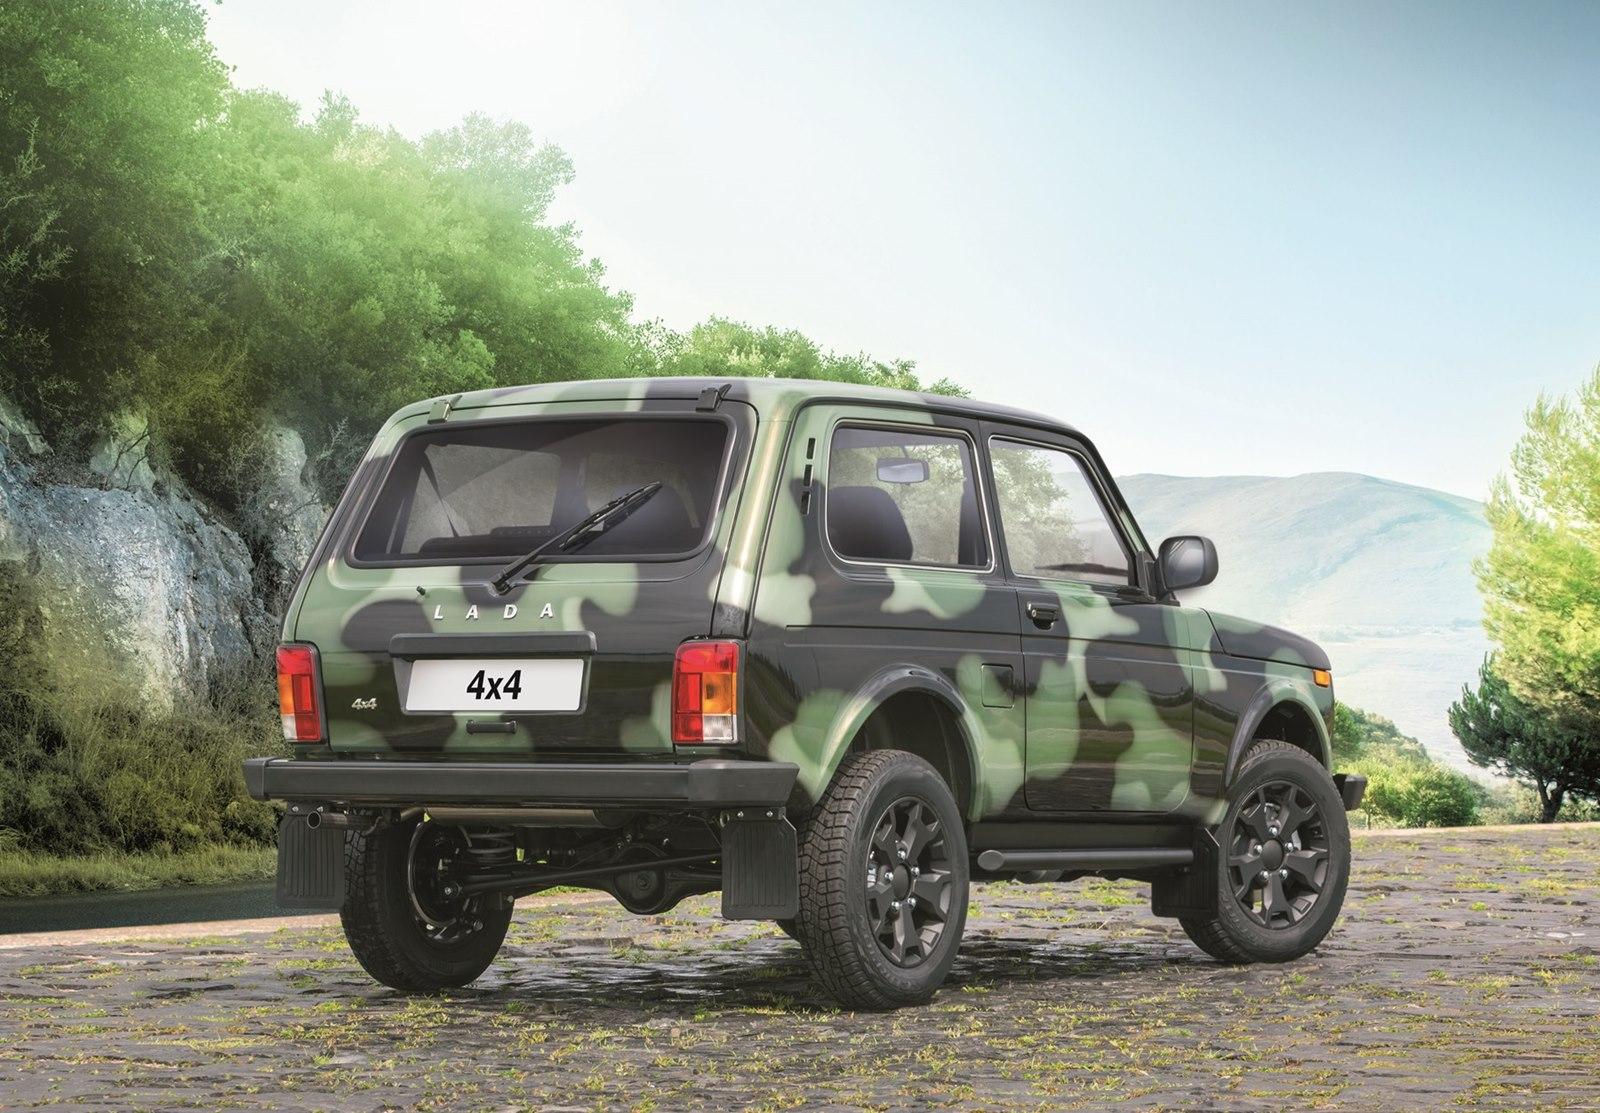 «АвтоВАЗ» добавил джипу Лада 4х4 камуфляжную окраску